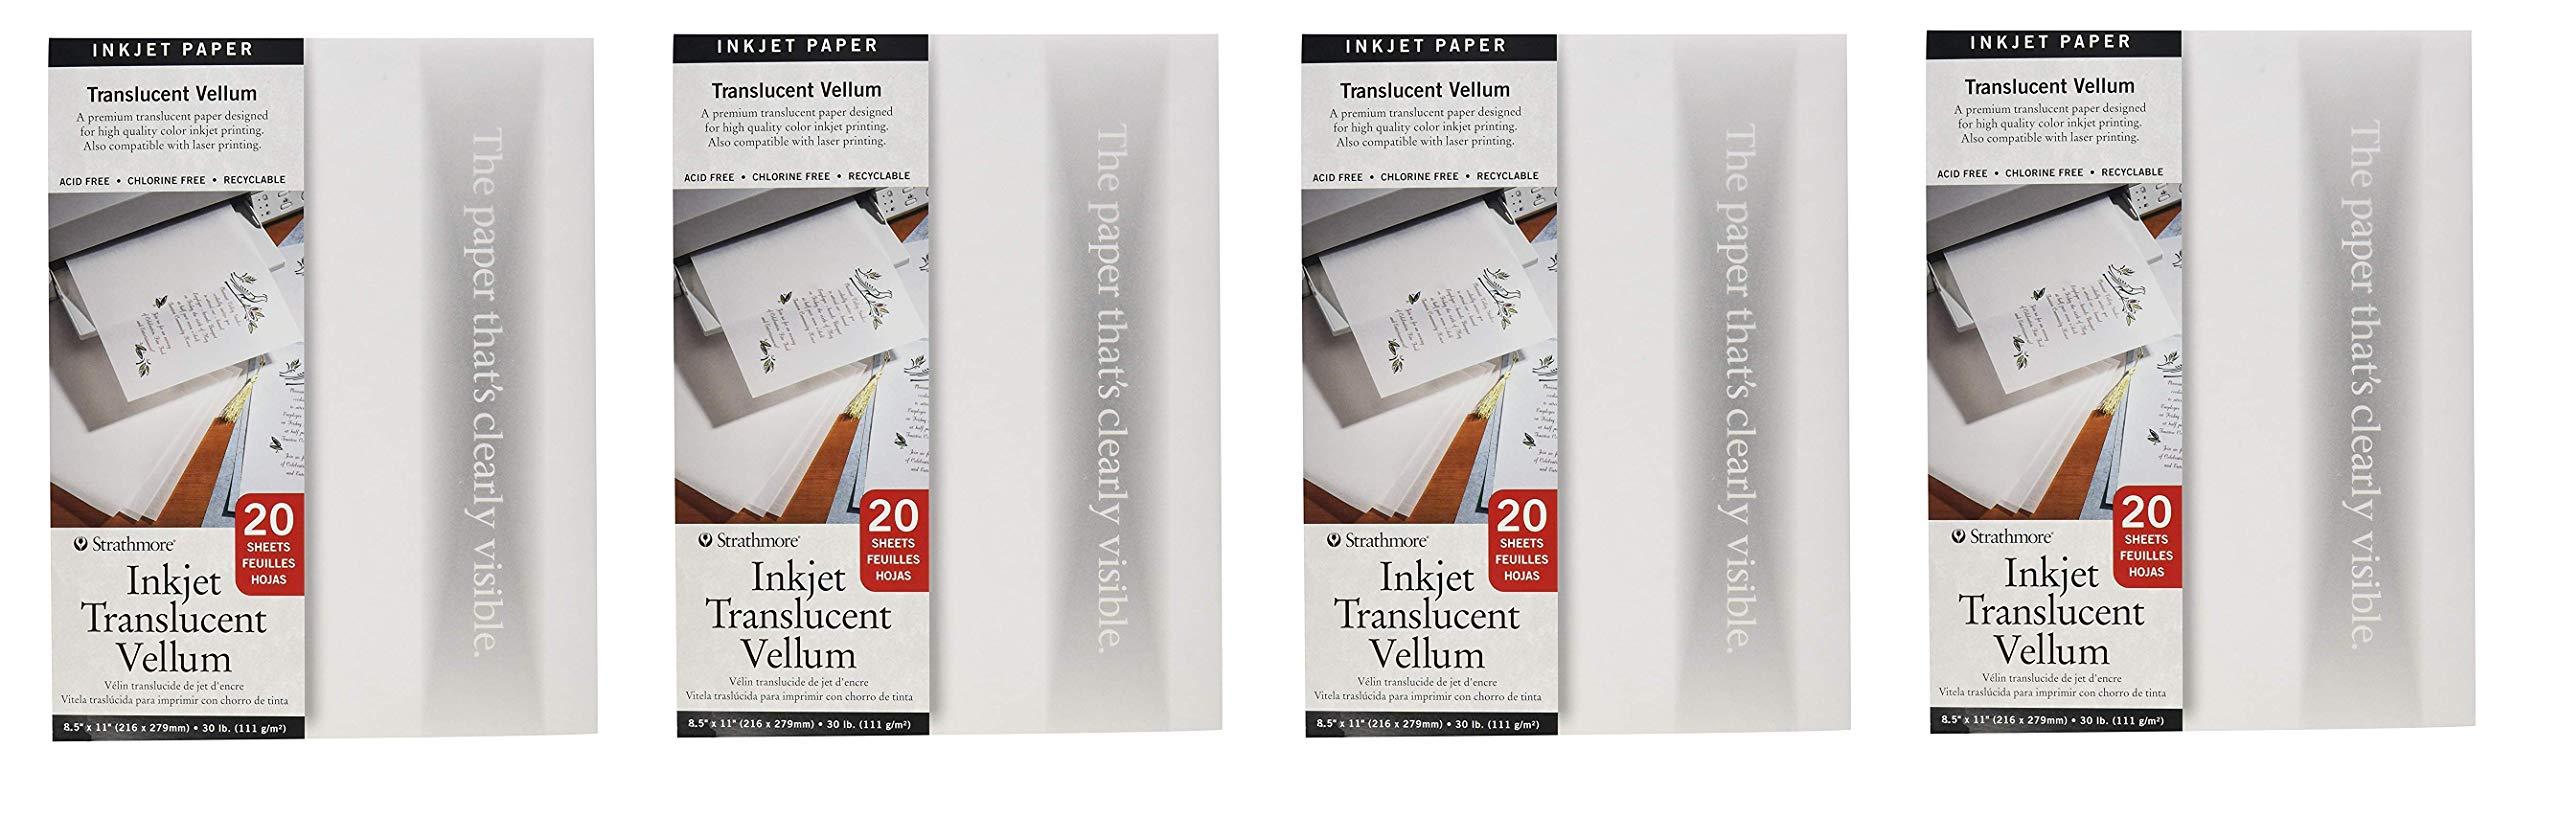 Strathmore 59-803 Translucent Vellum Inkjet Paper, 8.5''x11'', 20 Sheets (4-Pack)